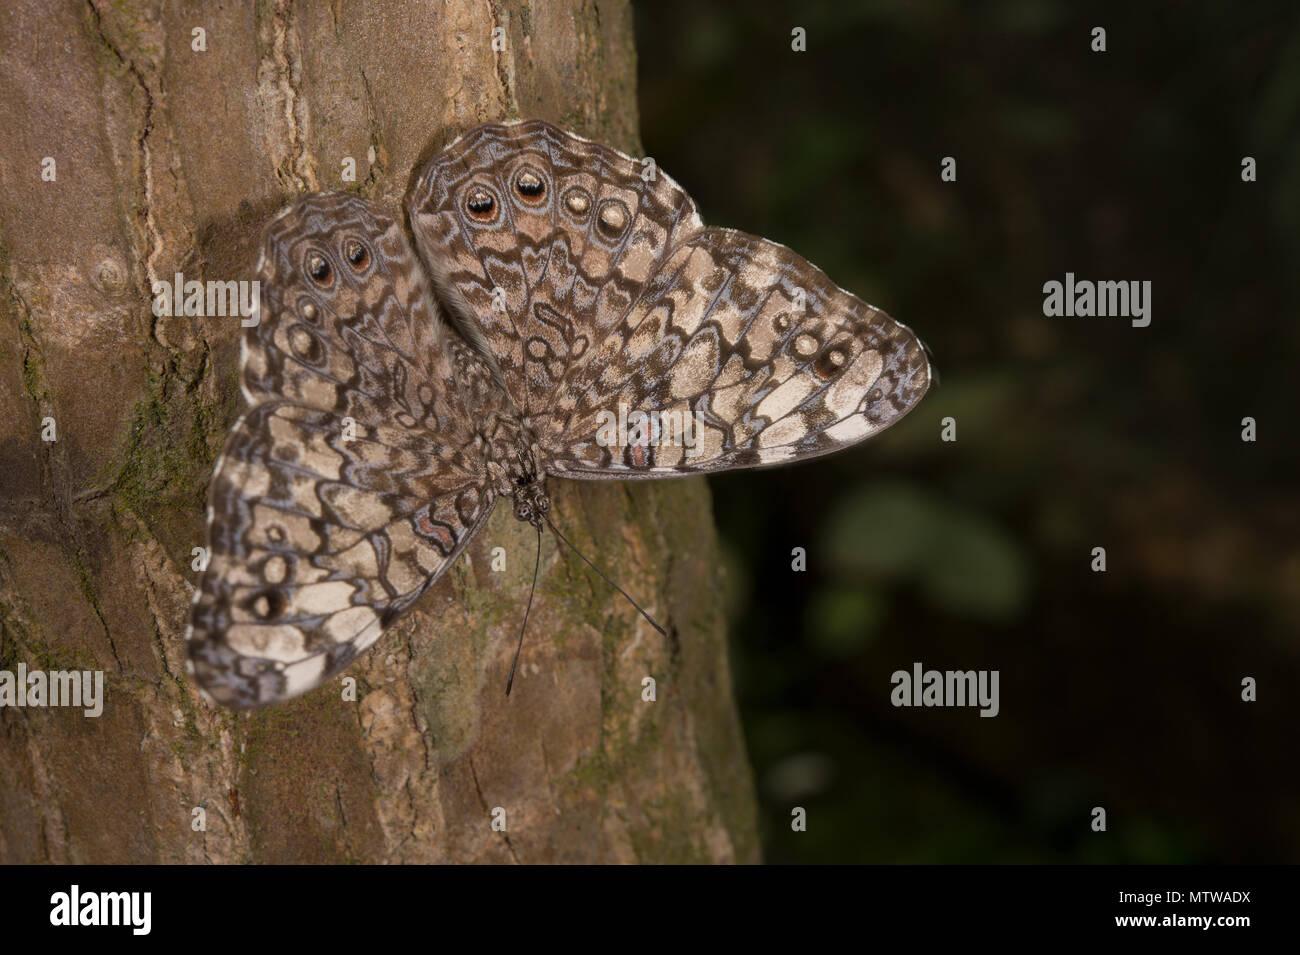 Gray Cracker, Hamadryas februa, Nymphalidae, Costa Rica - Stock Image